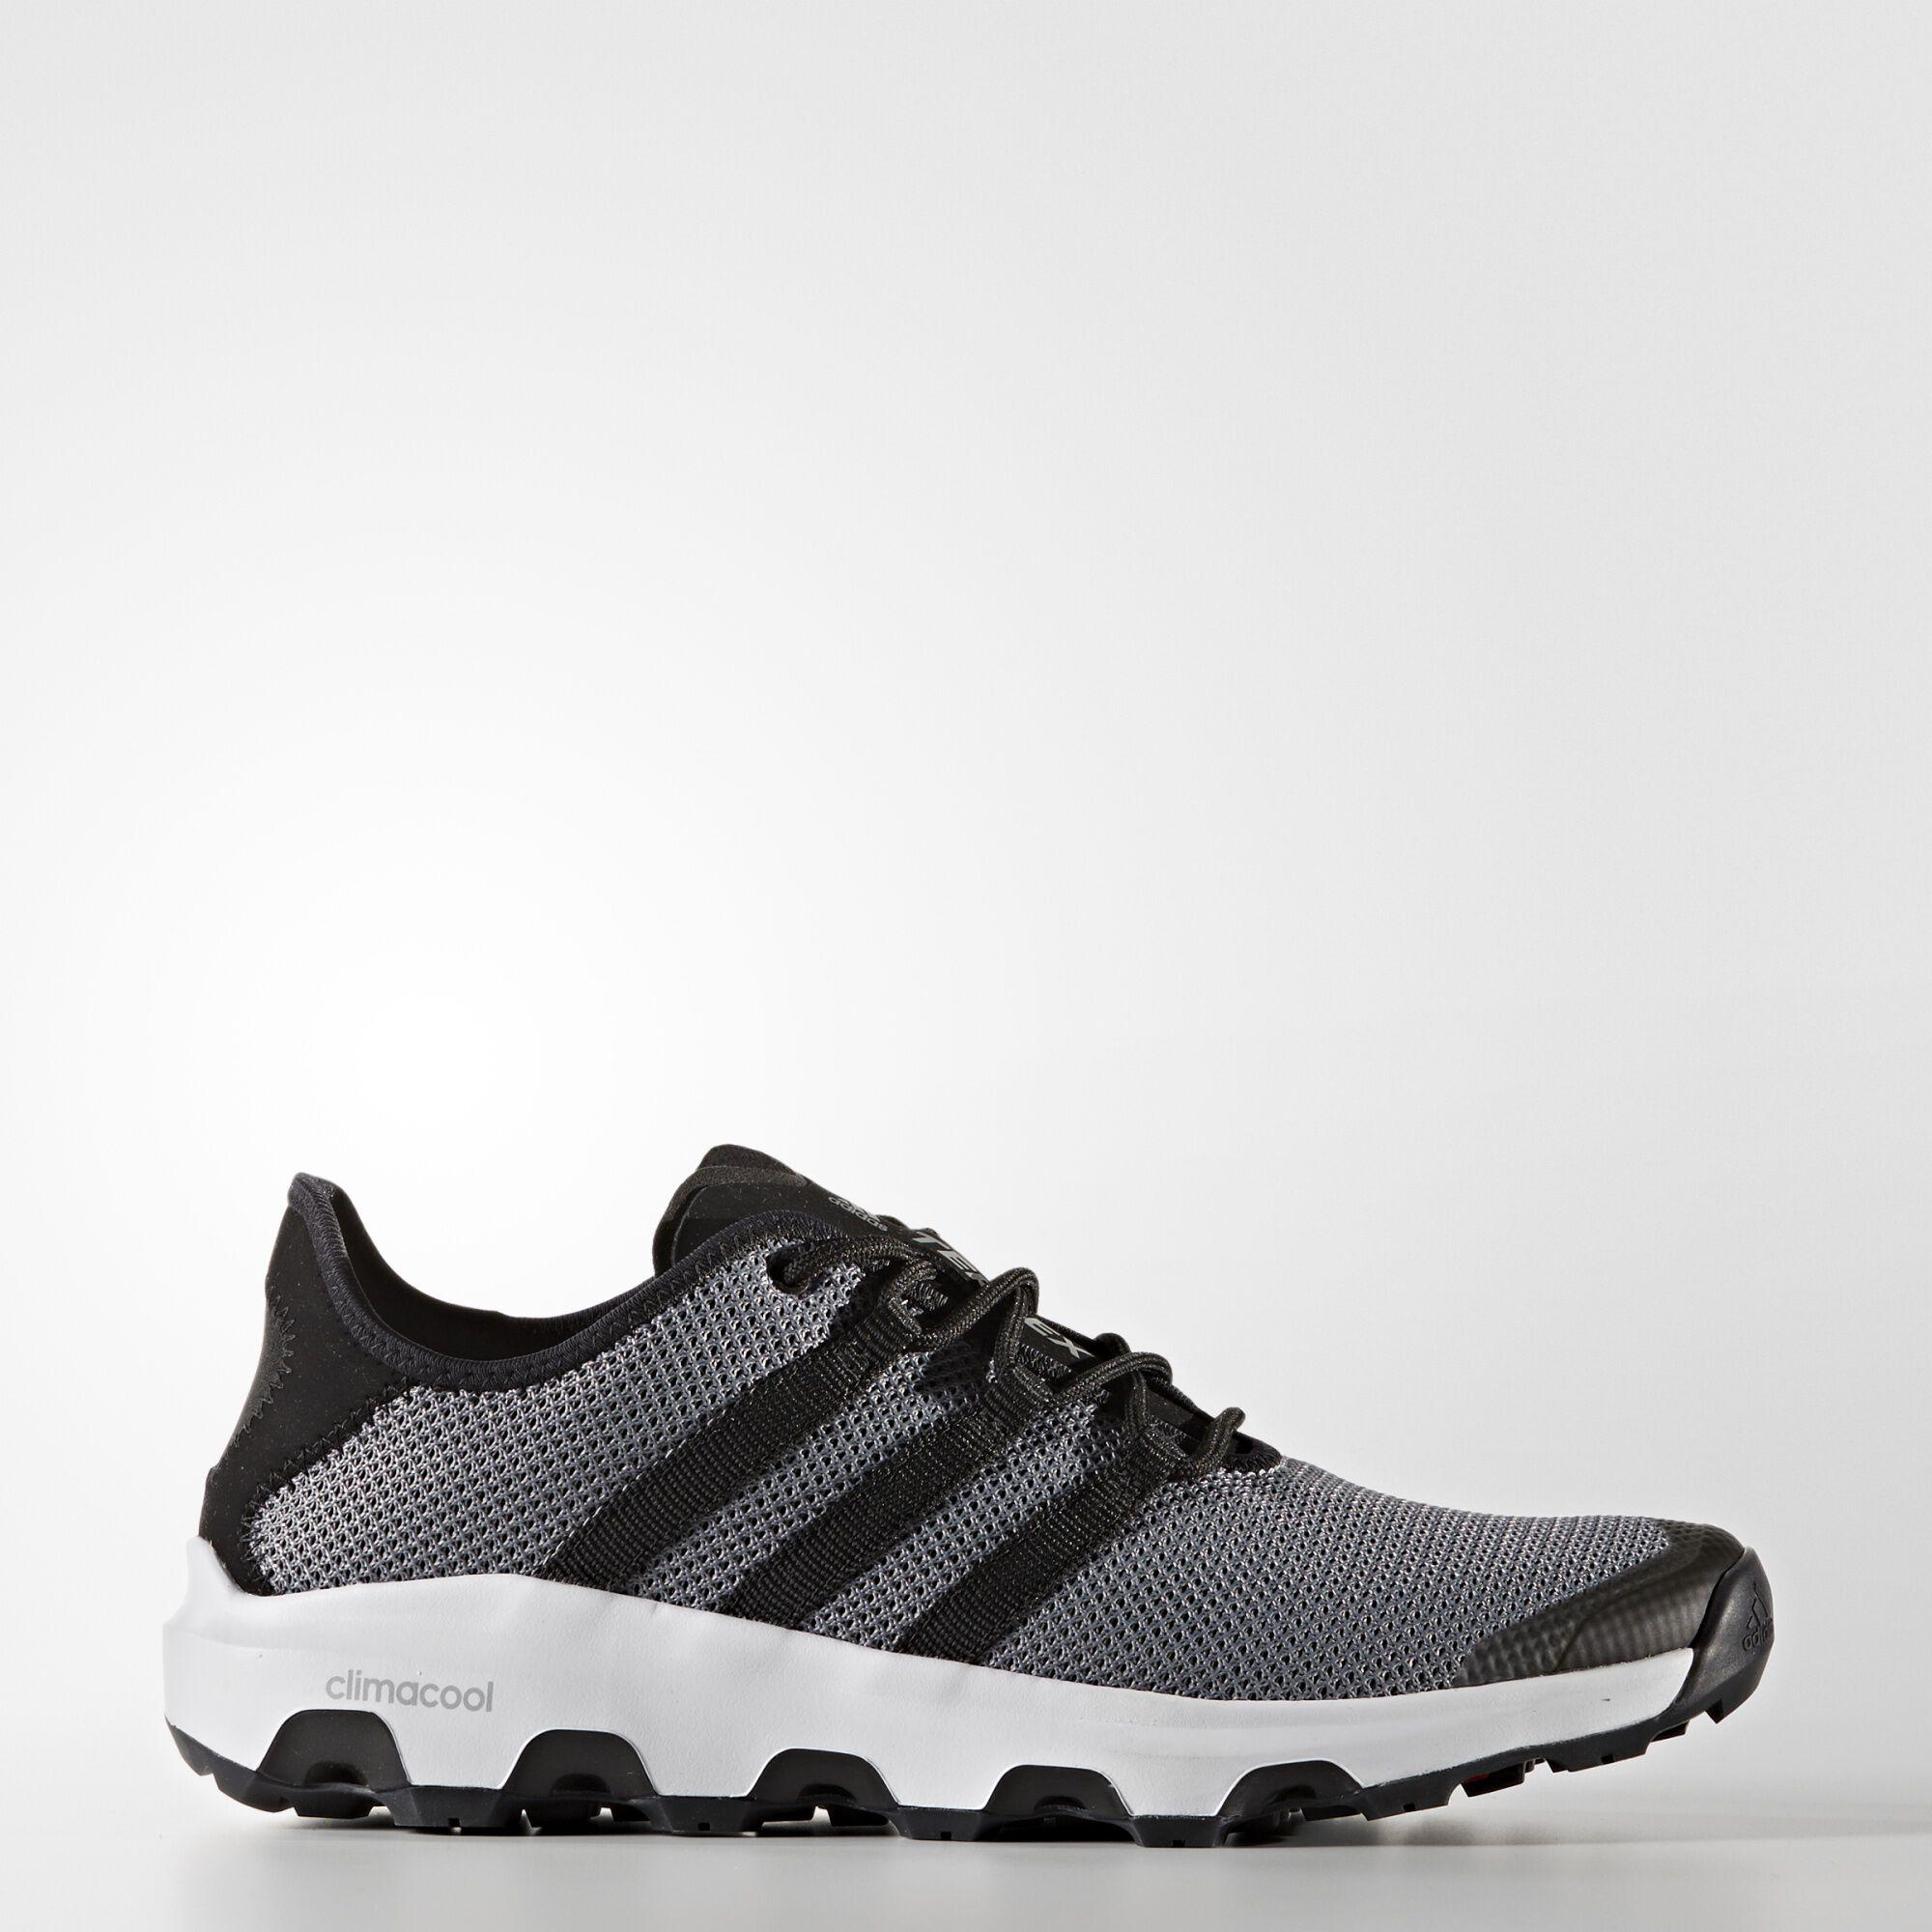 adidas for mens,adizero boots > OFF39% Originals Shoes